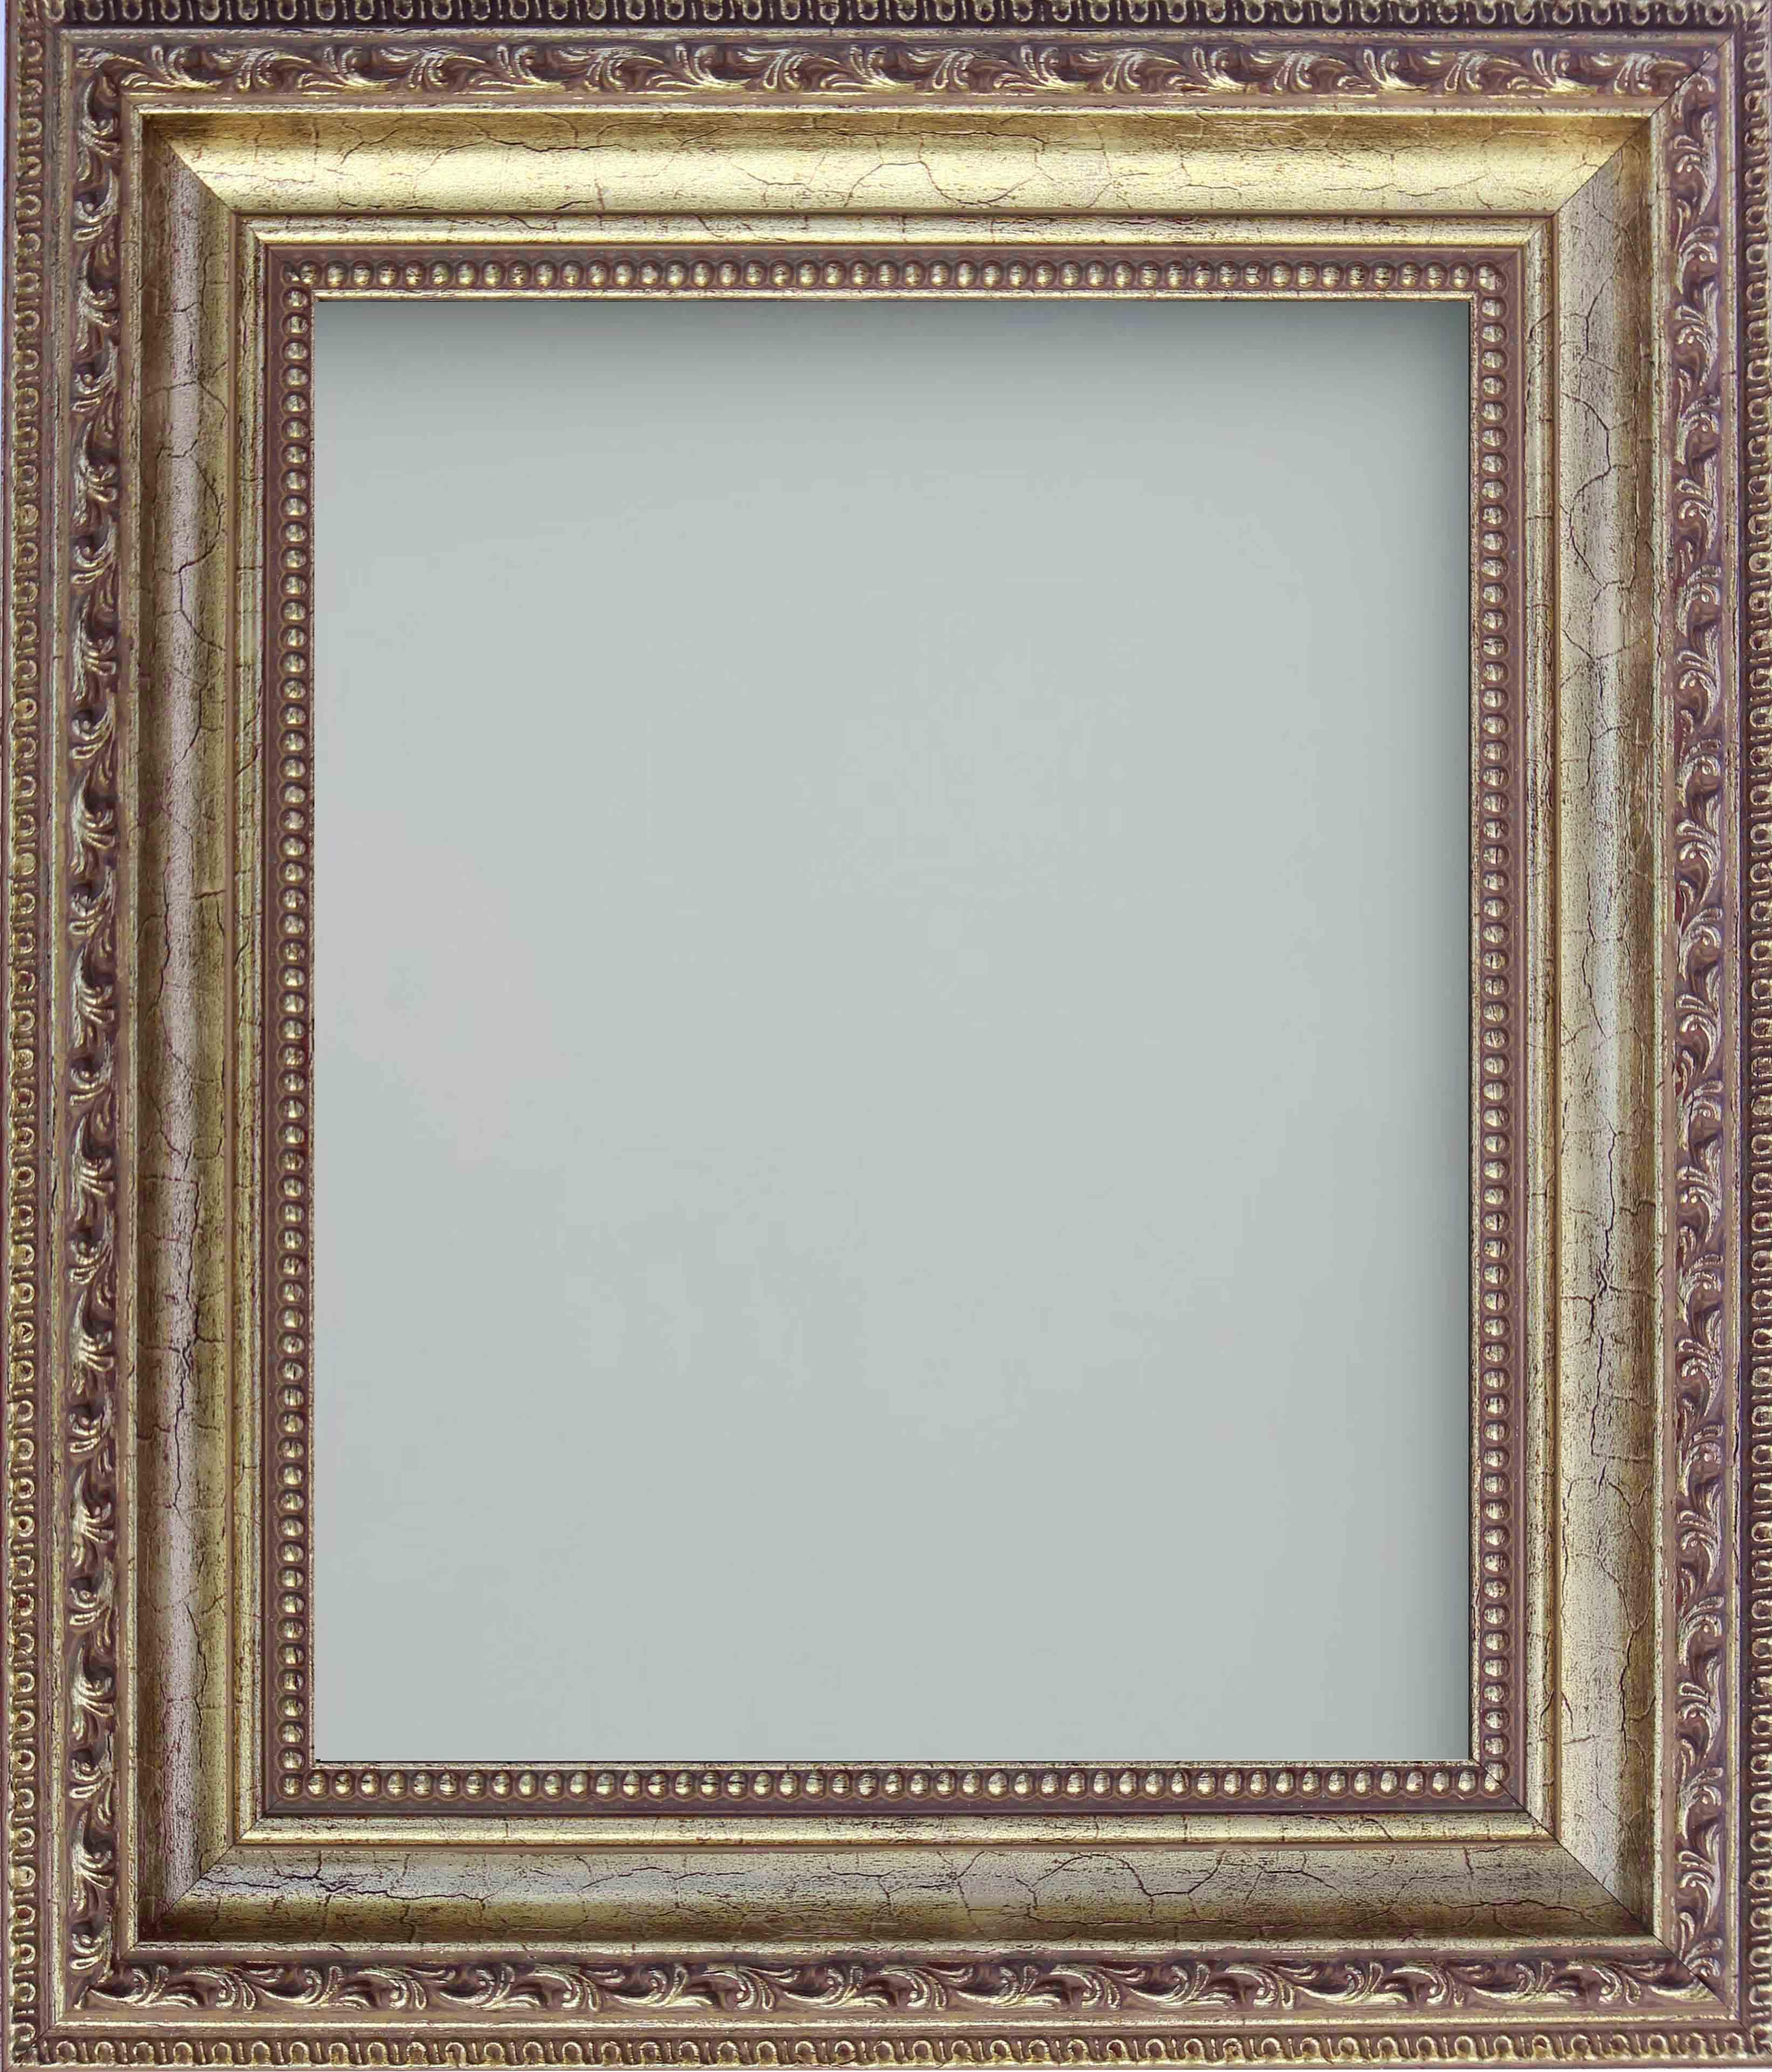 Frame Company Fiorelli Range Wooden Swept Ornate Vintage Picture ...